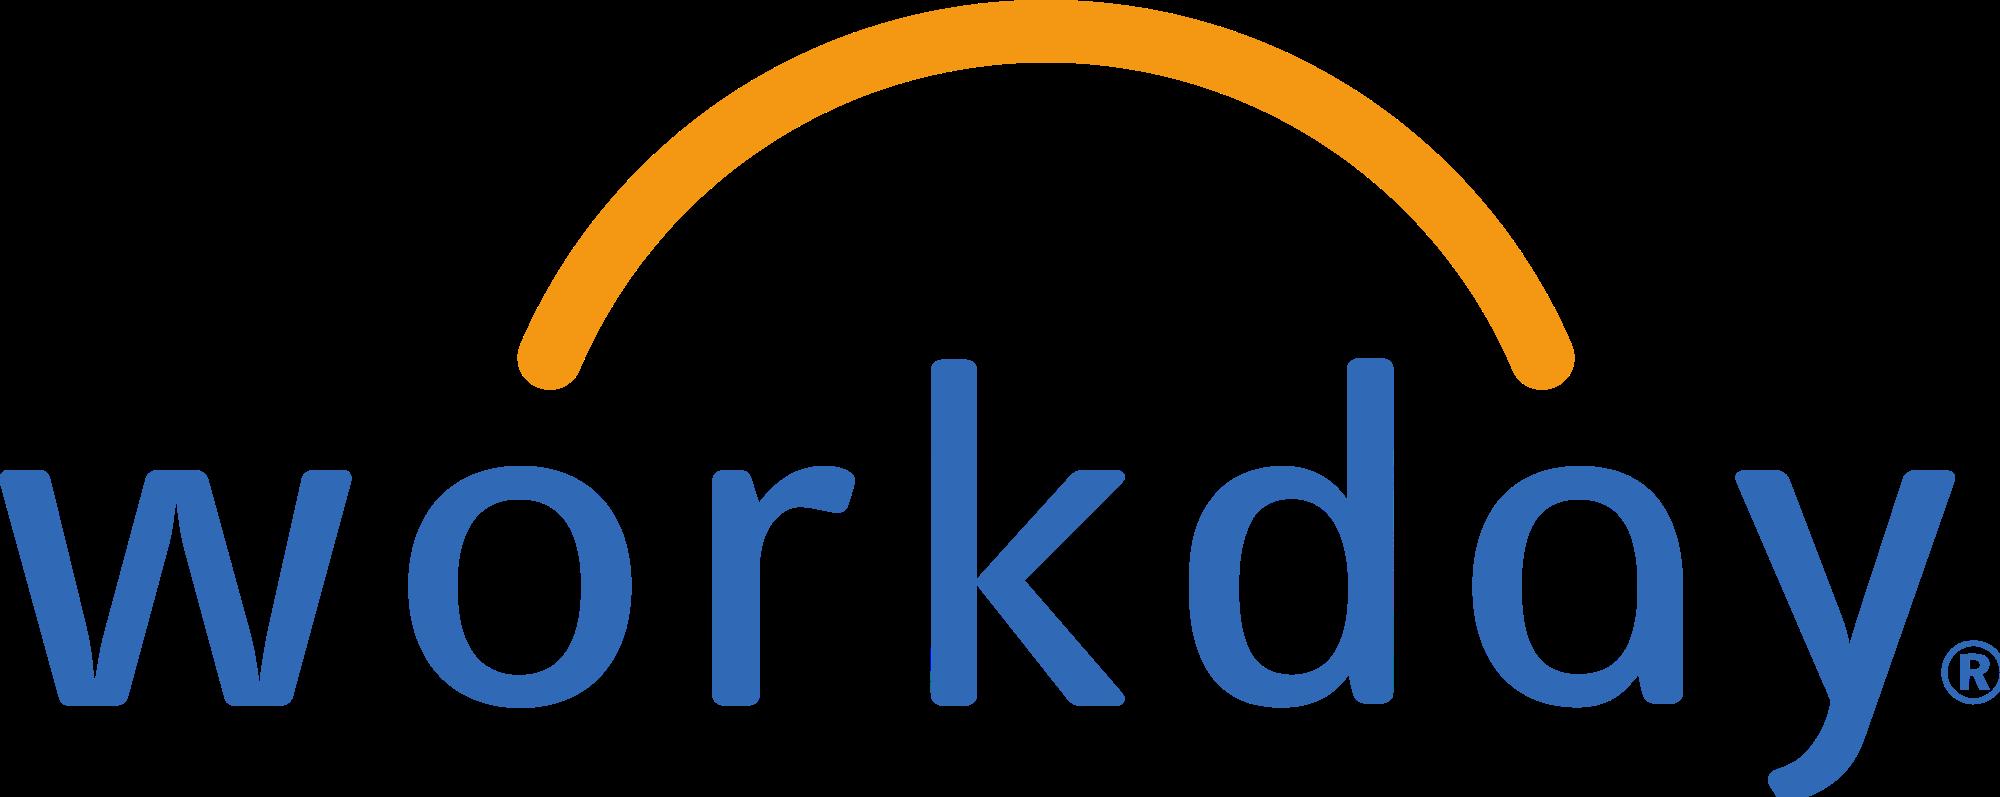 Workday Talent Management logo